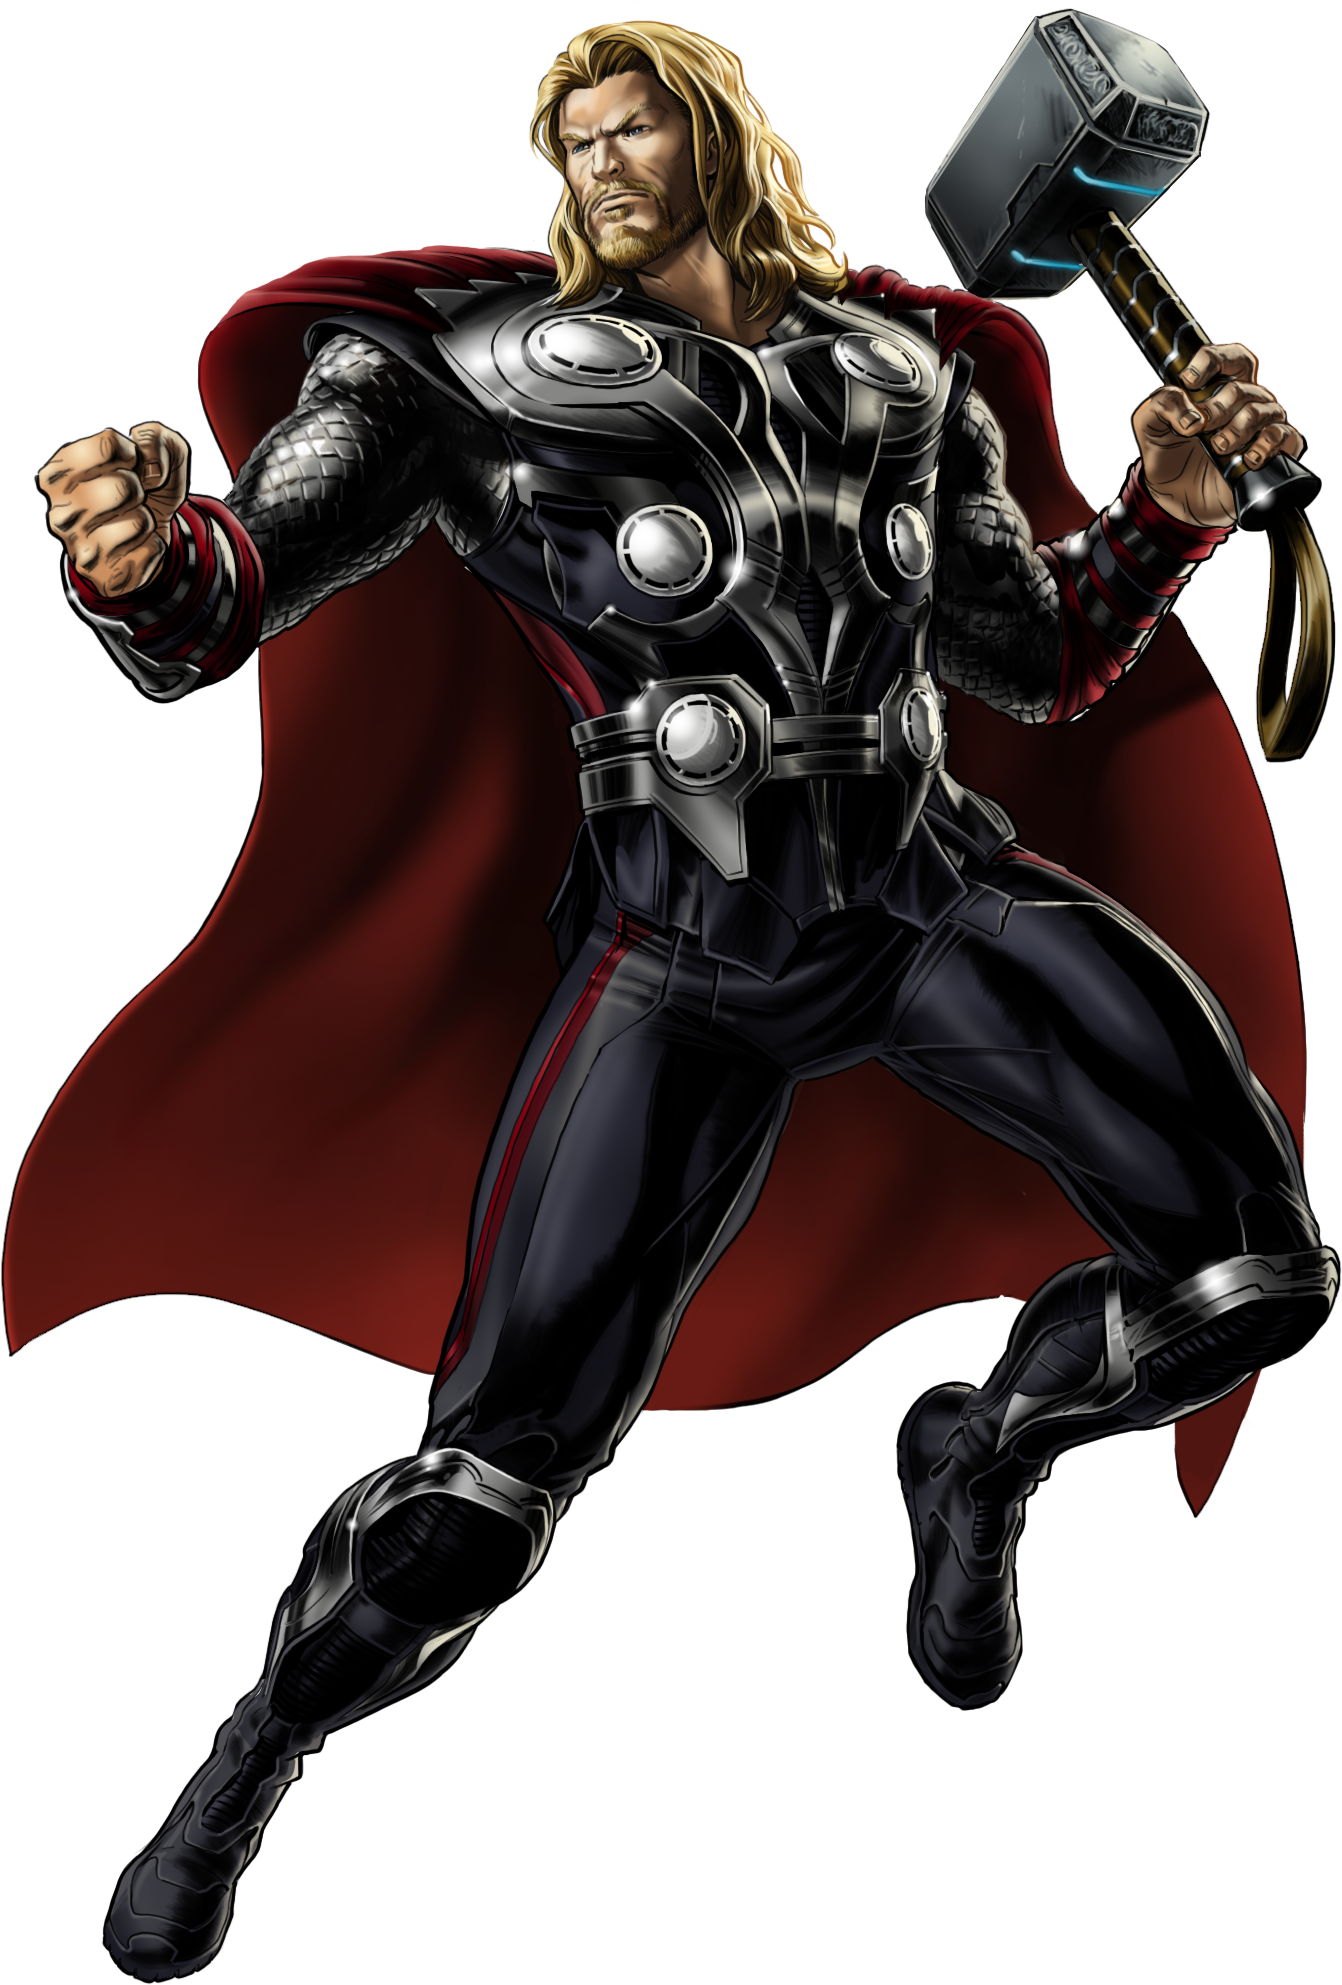 Image Avengers Thor Right Portrait Art Png Marvel